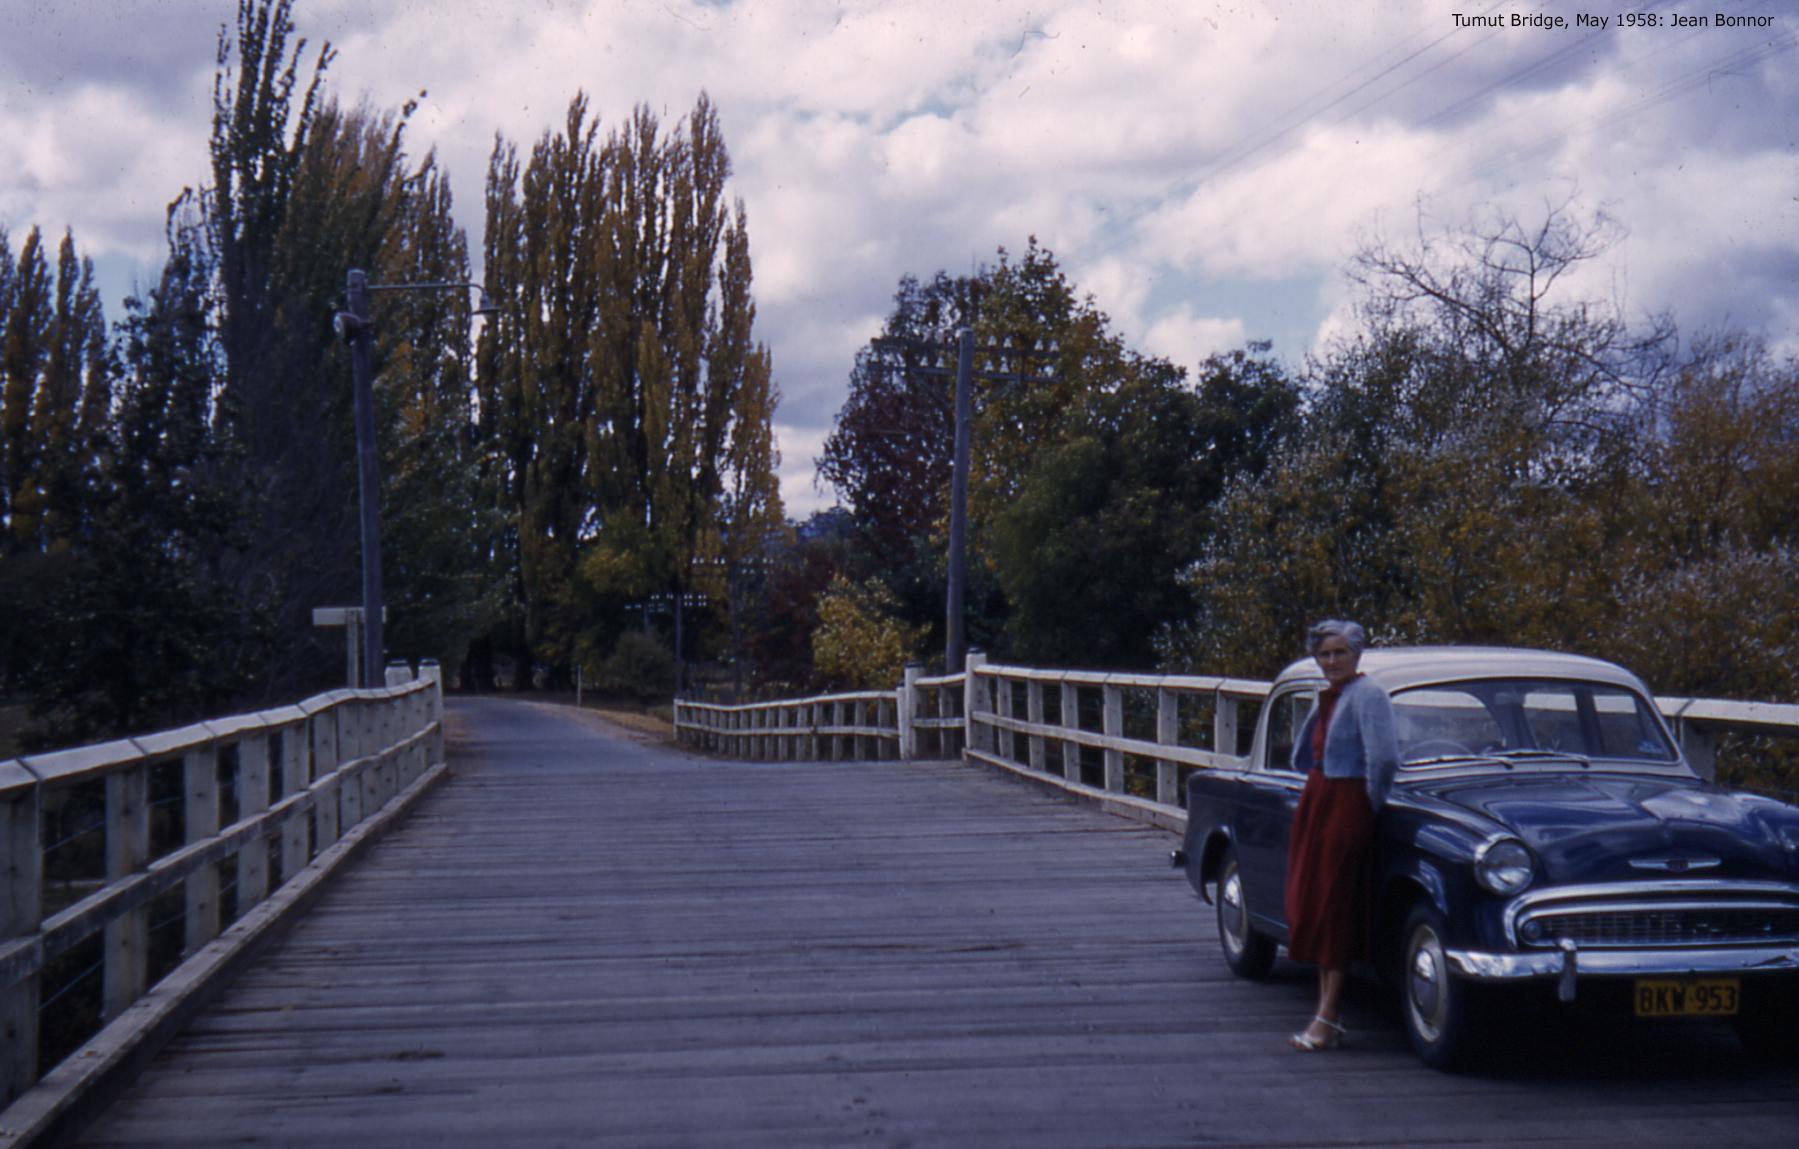 ChrisBonnor-1954Tumut Bridge